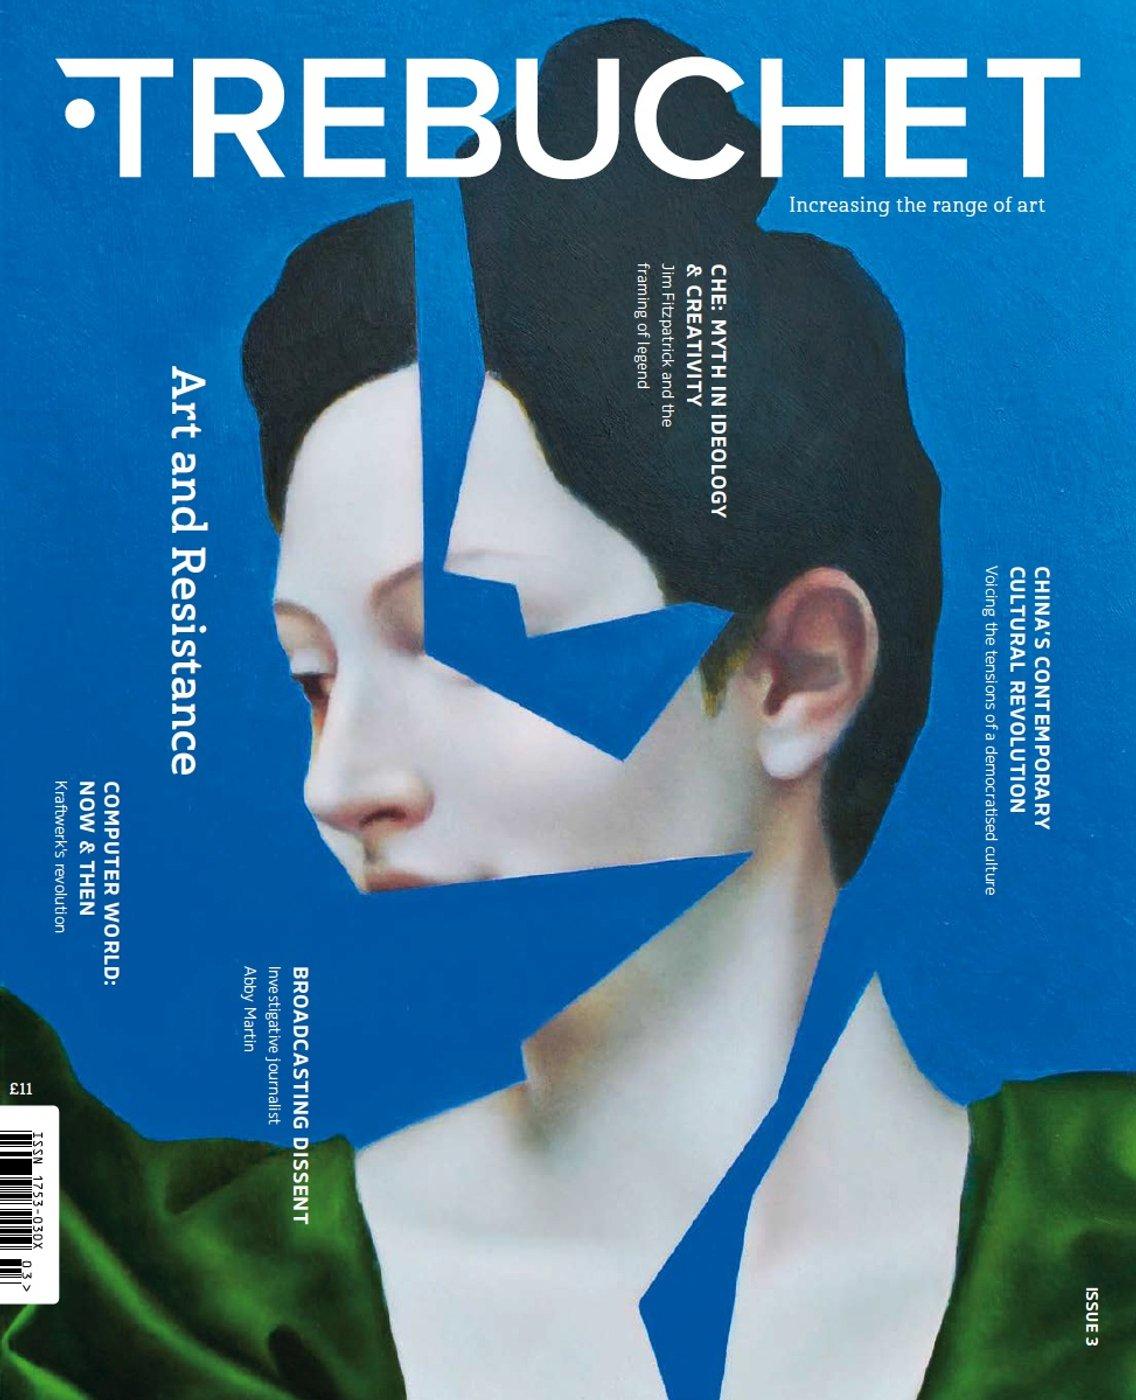 Trebuchet Talks - Cover Image